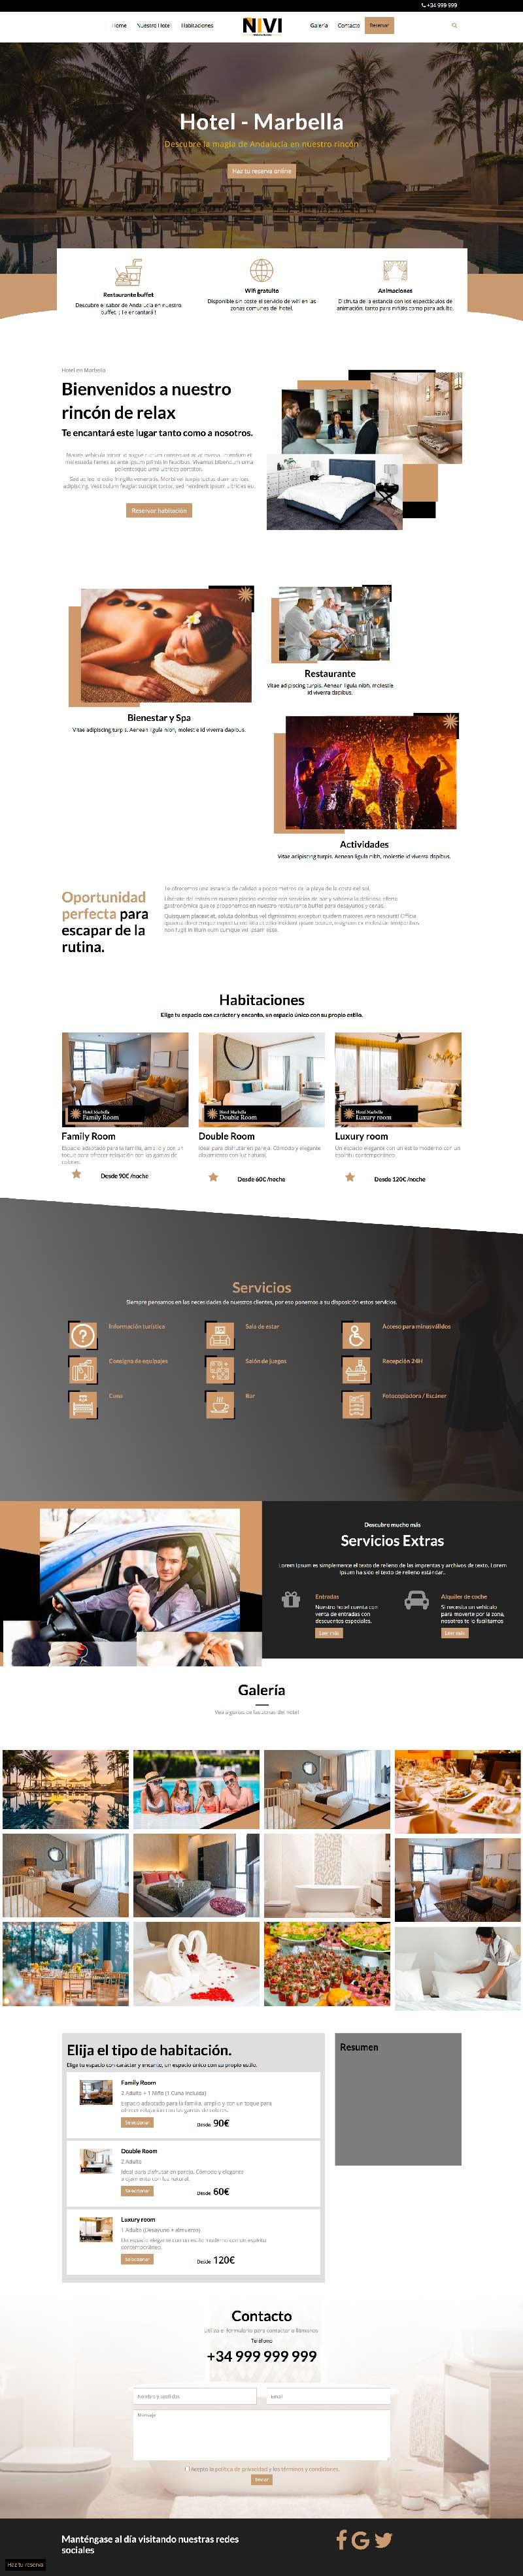 Plantilla web para hotel Wordpress Niviweb